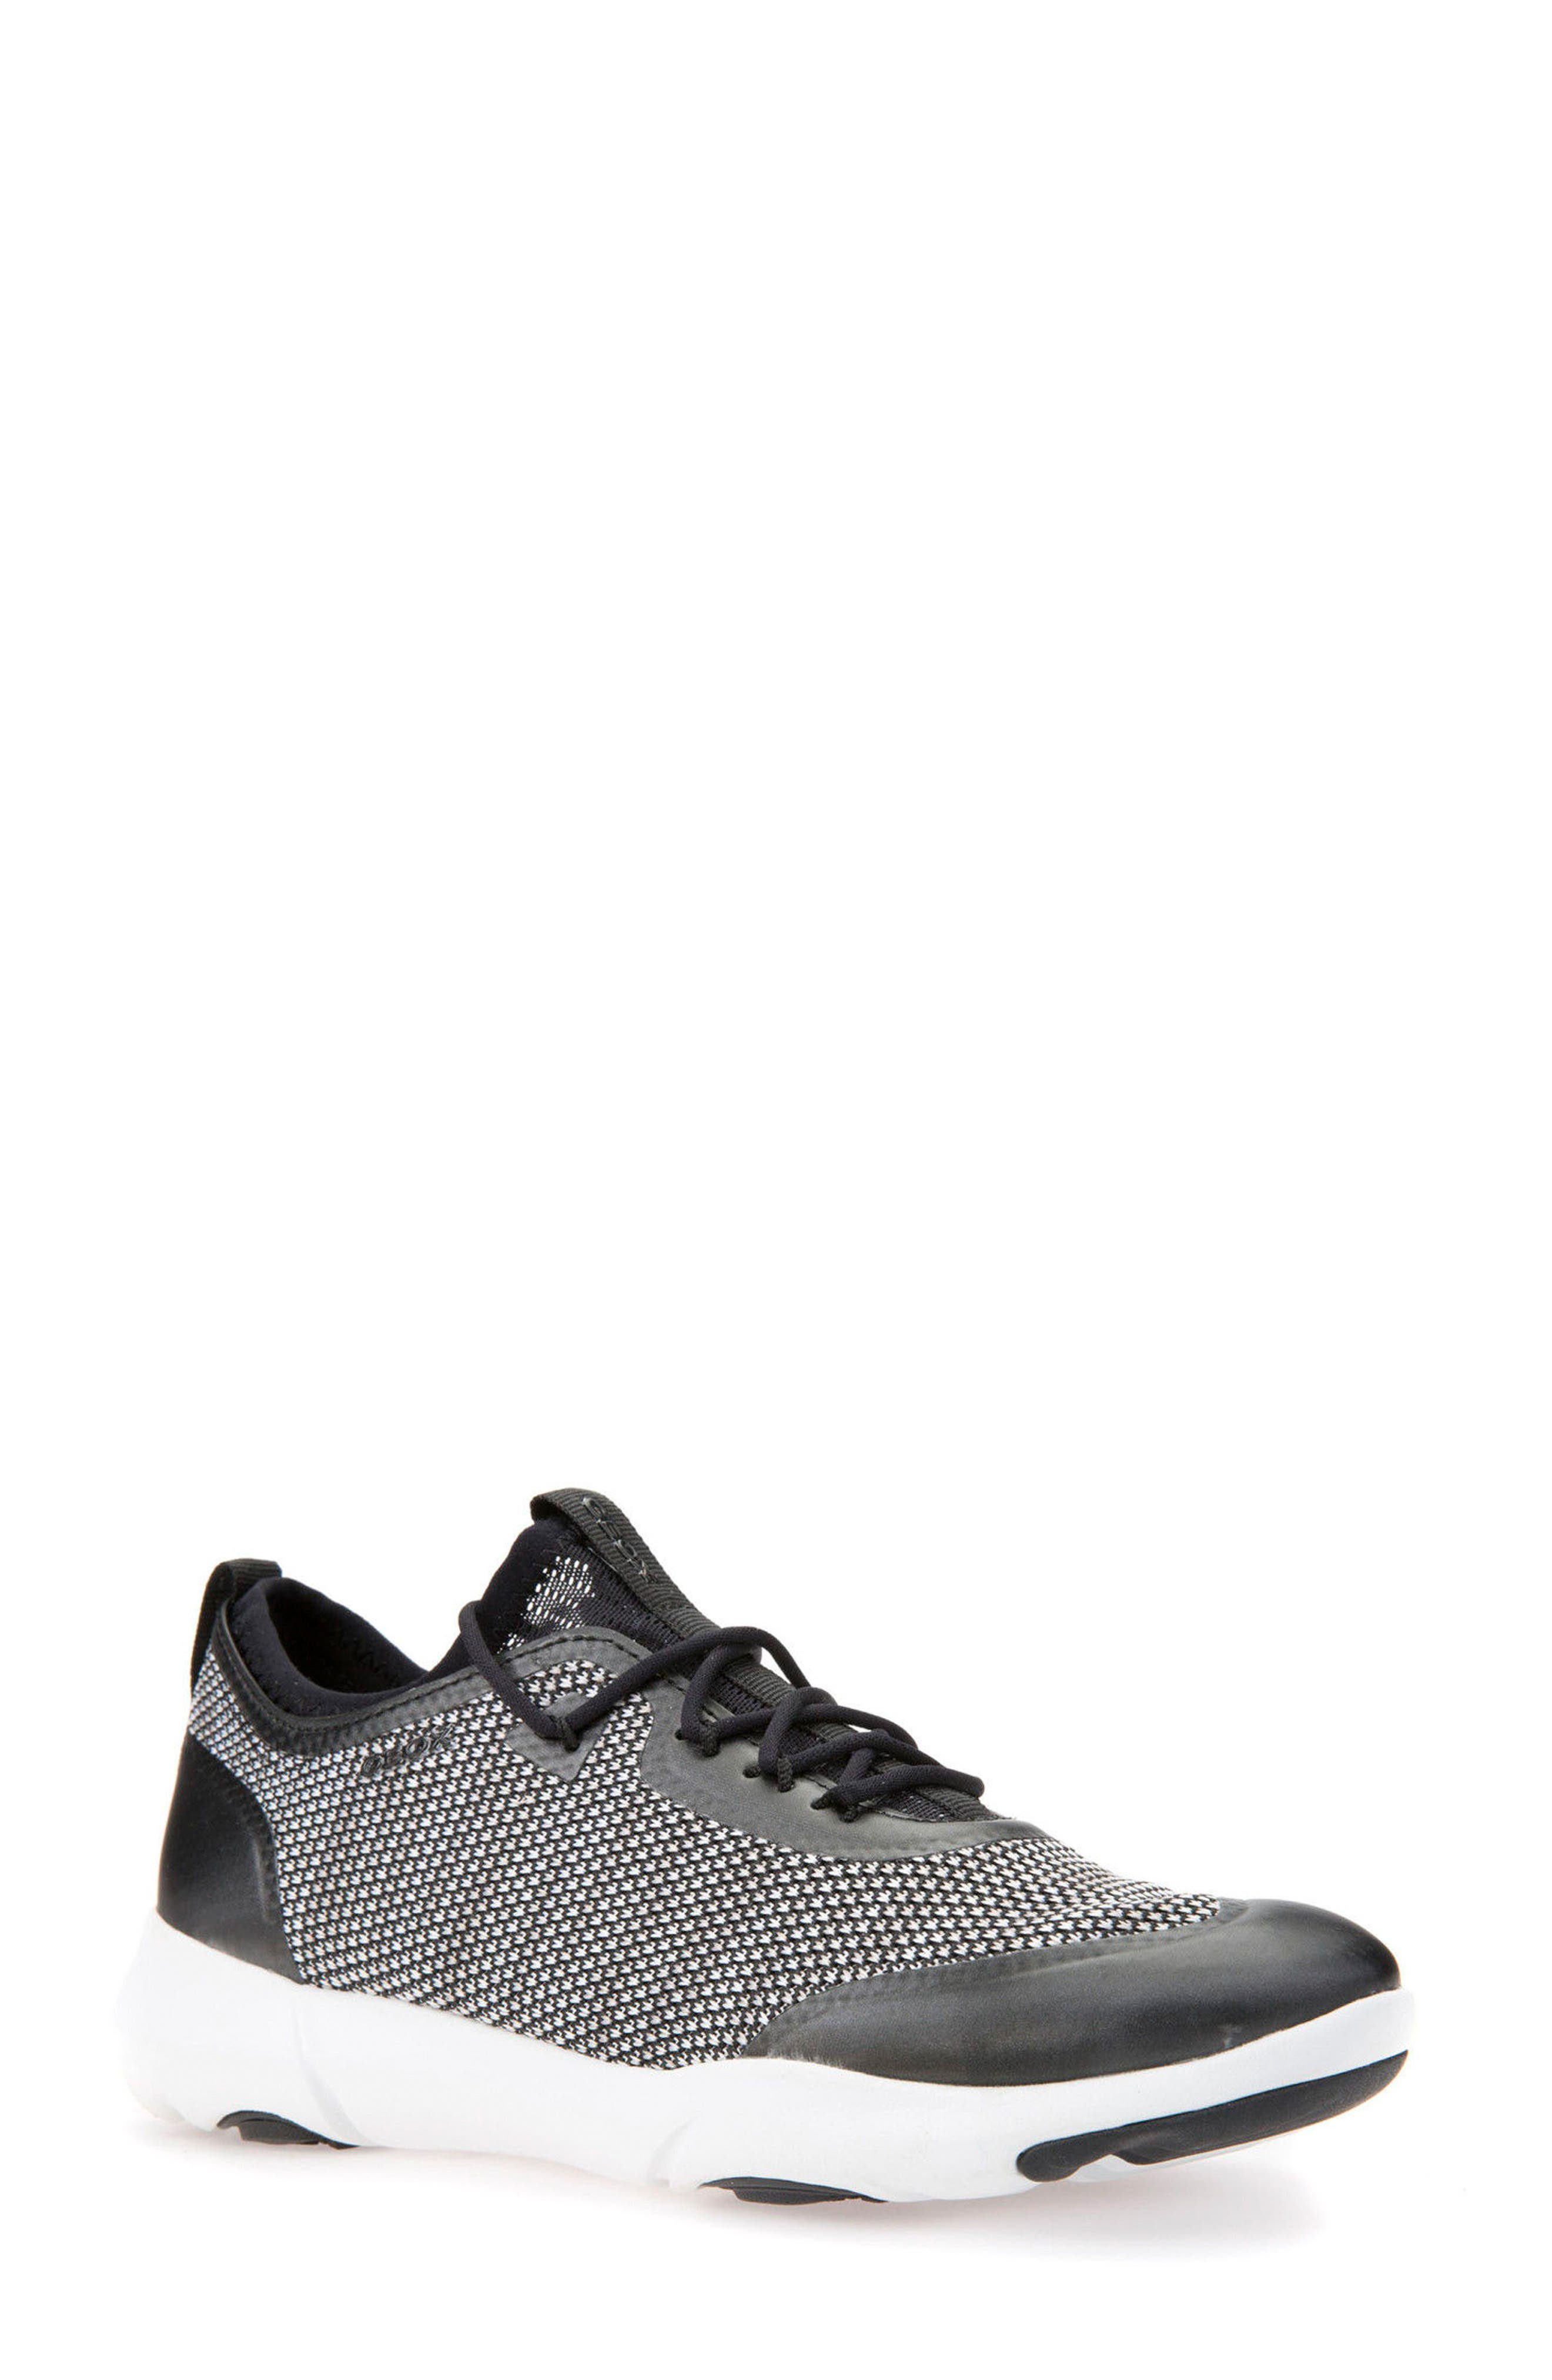 Nebula X Knit Sneaker,                         Main,                         color, BLACK/ WHITE LEATHER